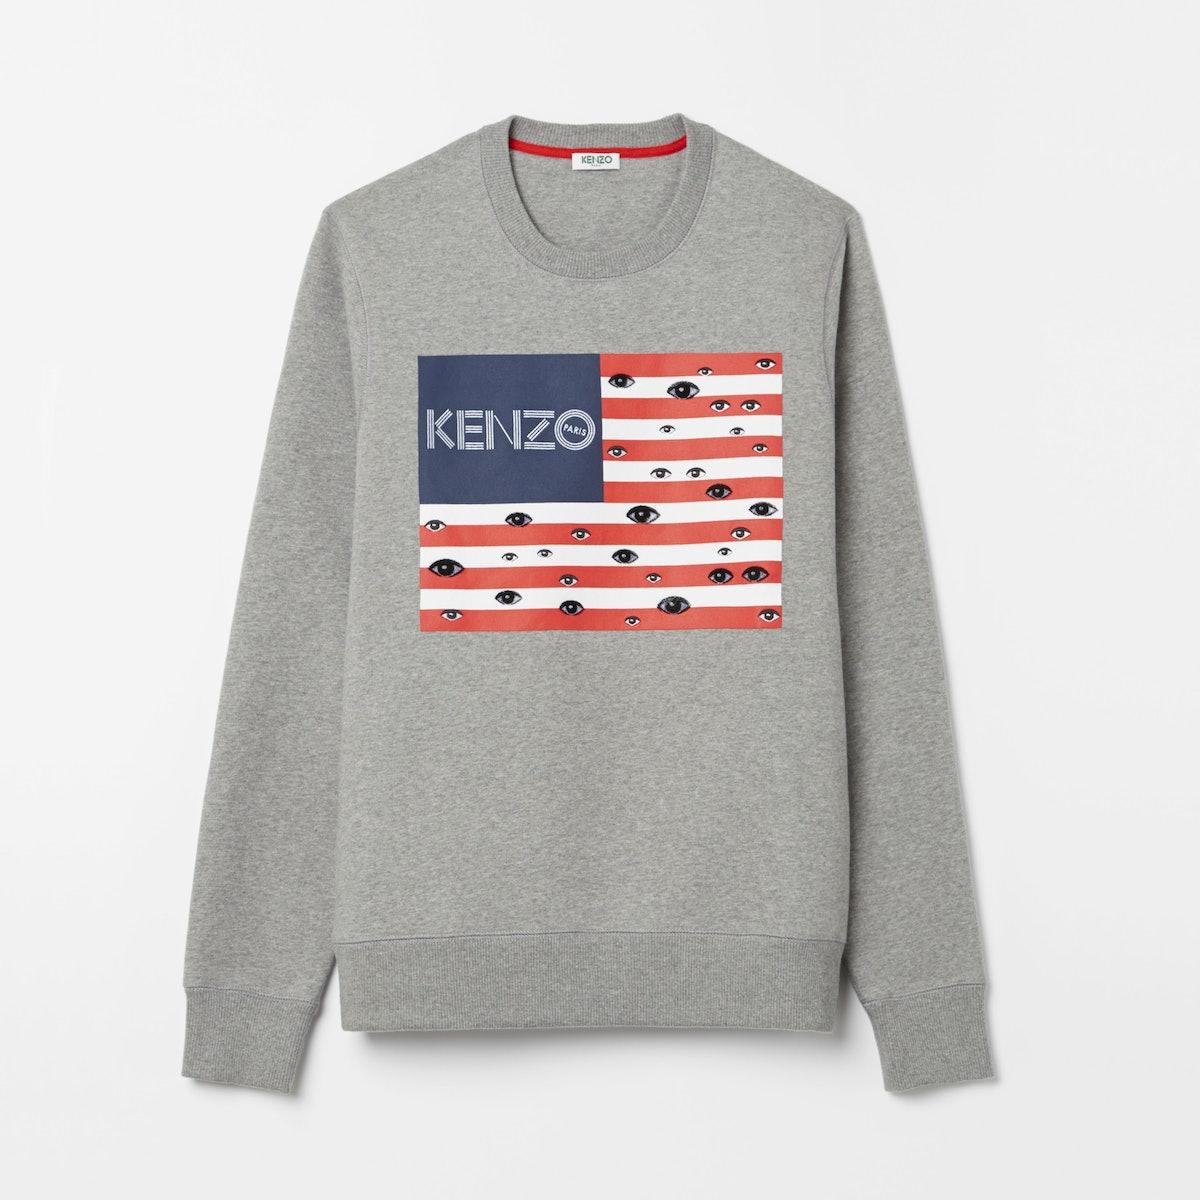 Kenzo x TOILETPAPER sweatshirt